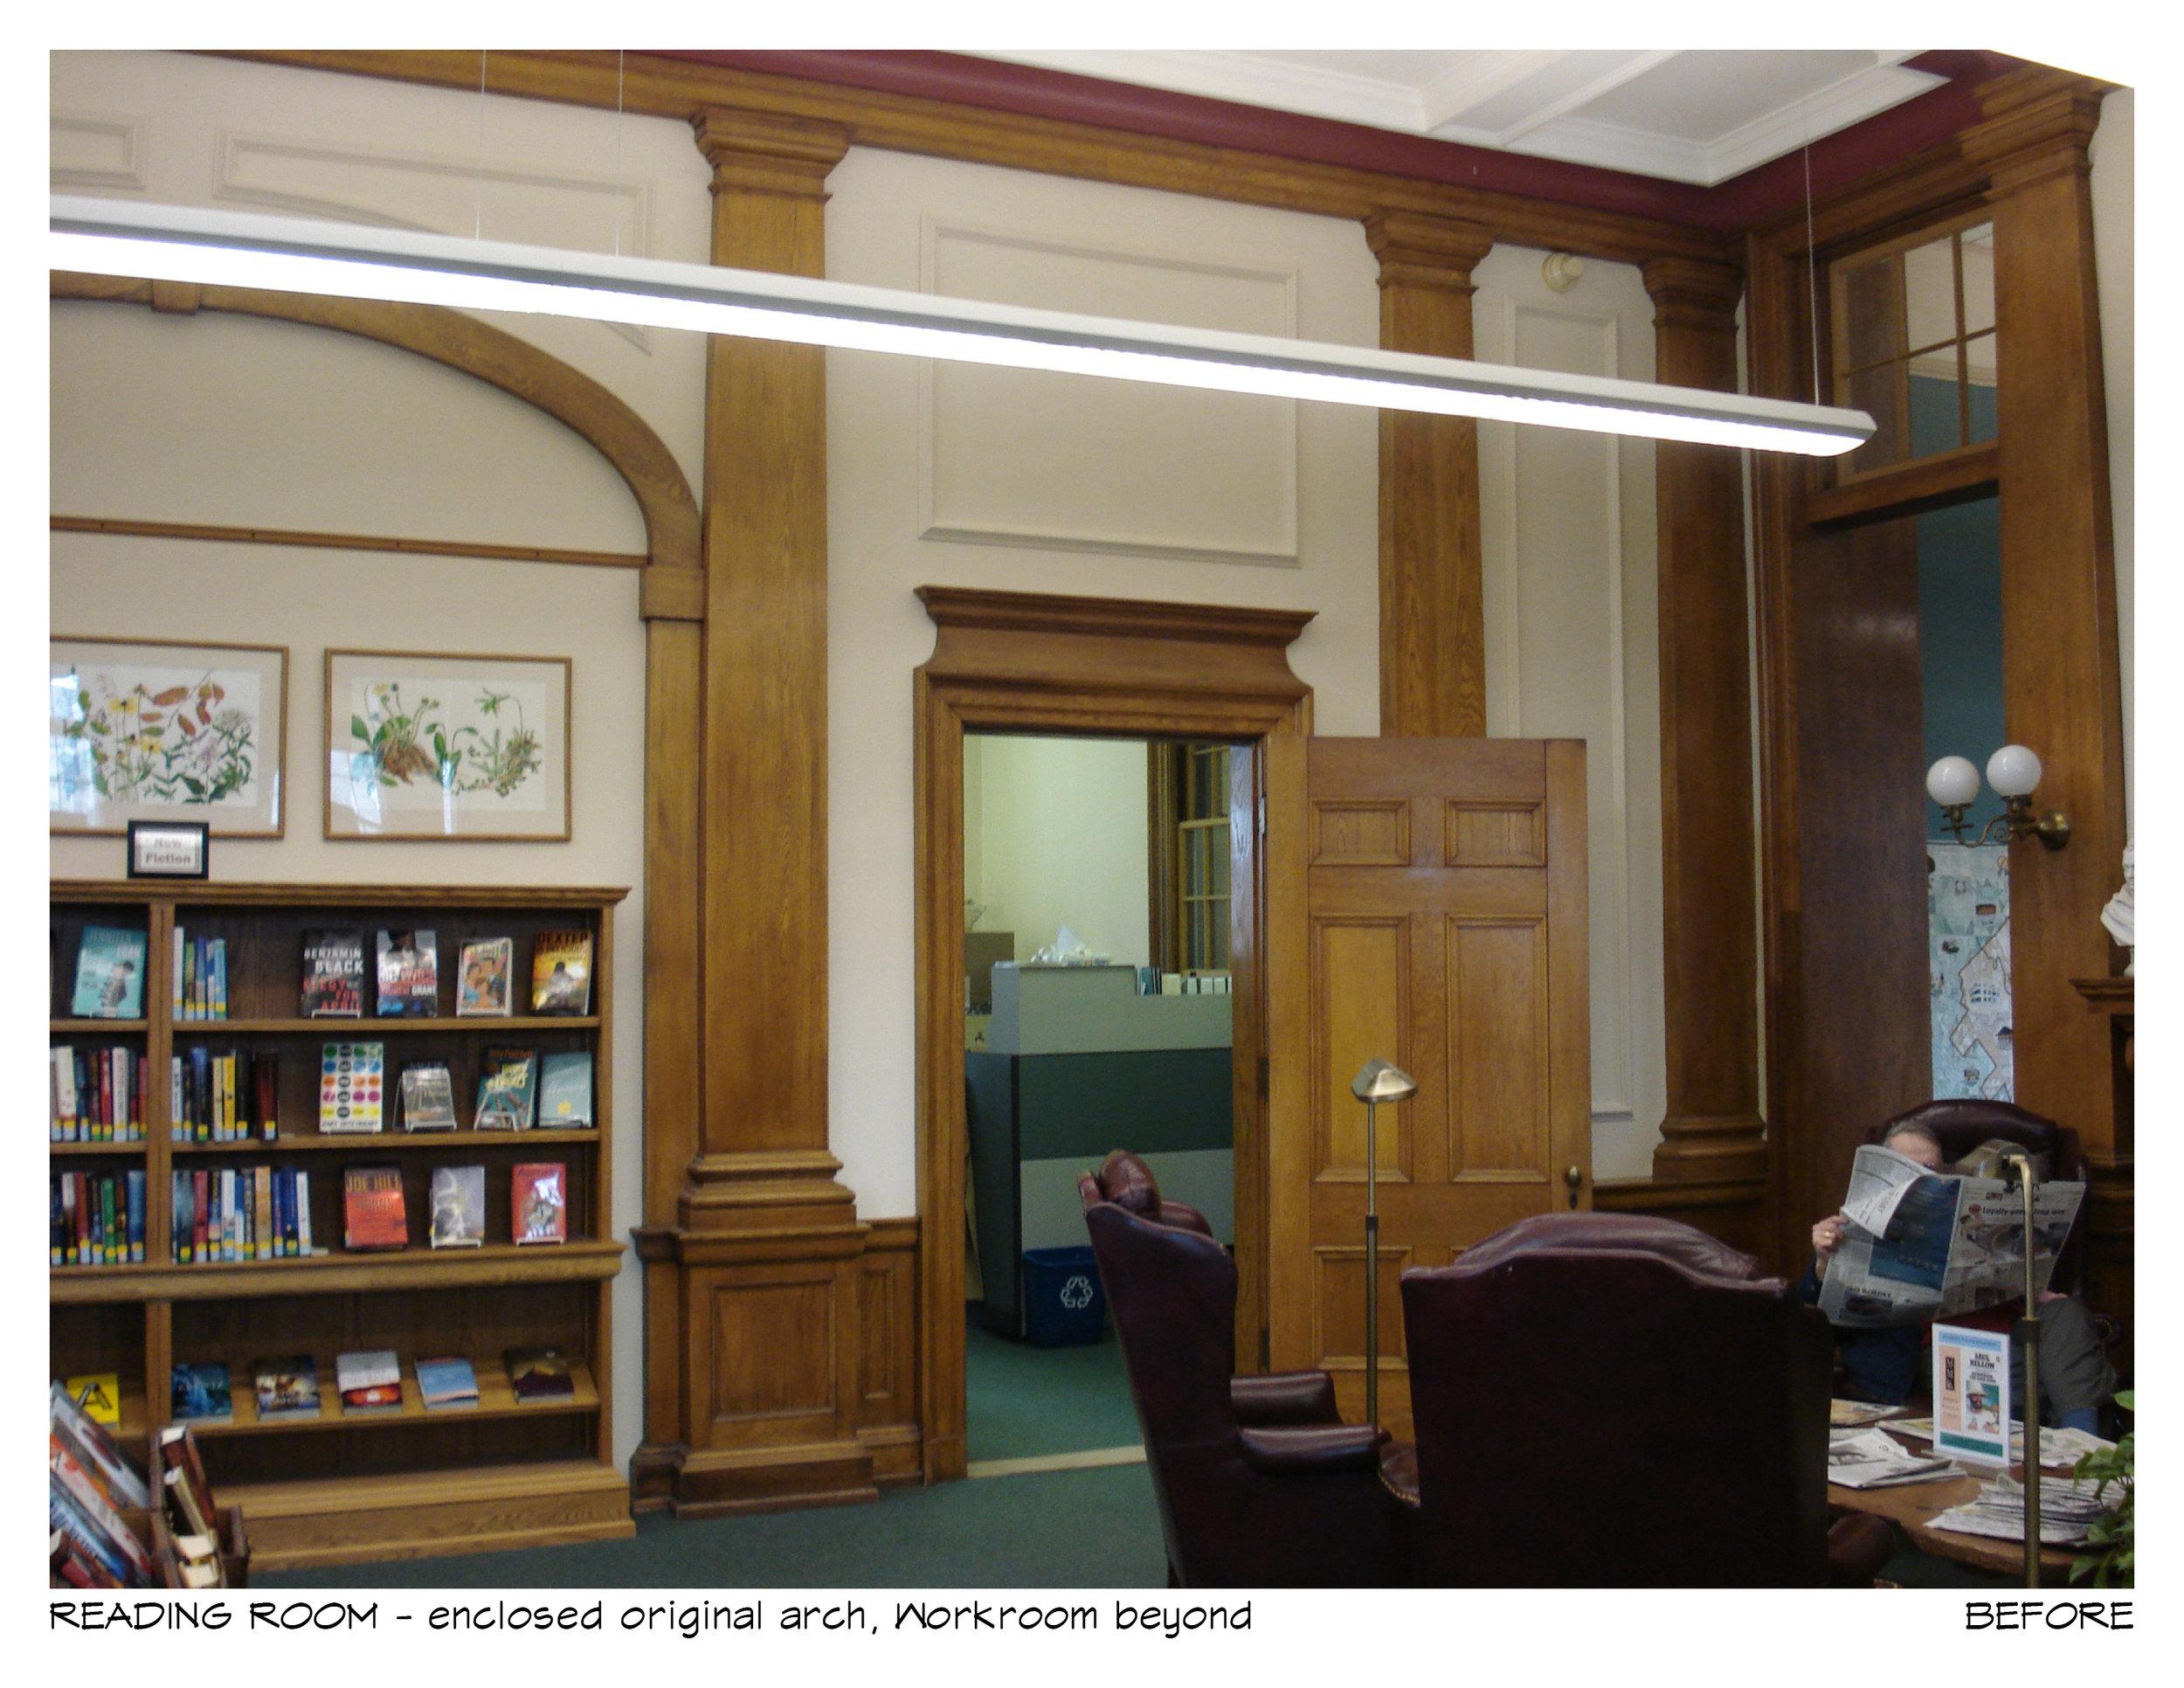 Merrill Lib_08_Reading Room Before_2016_0722.jpg